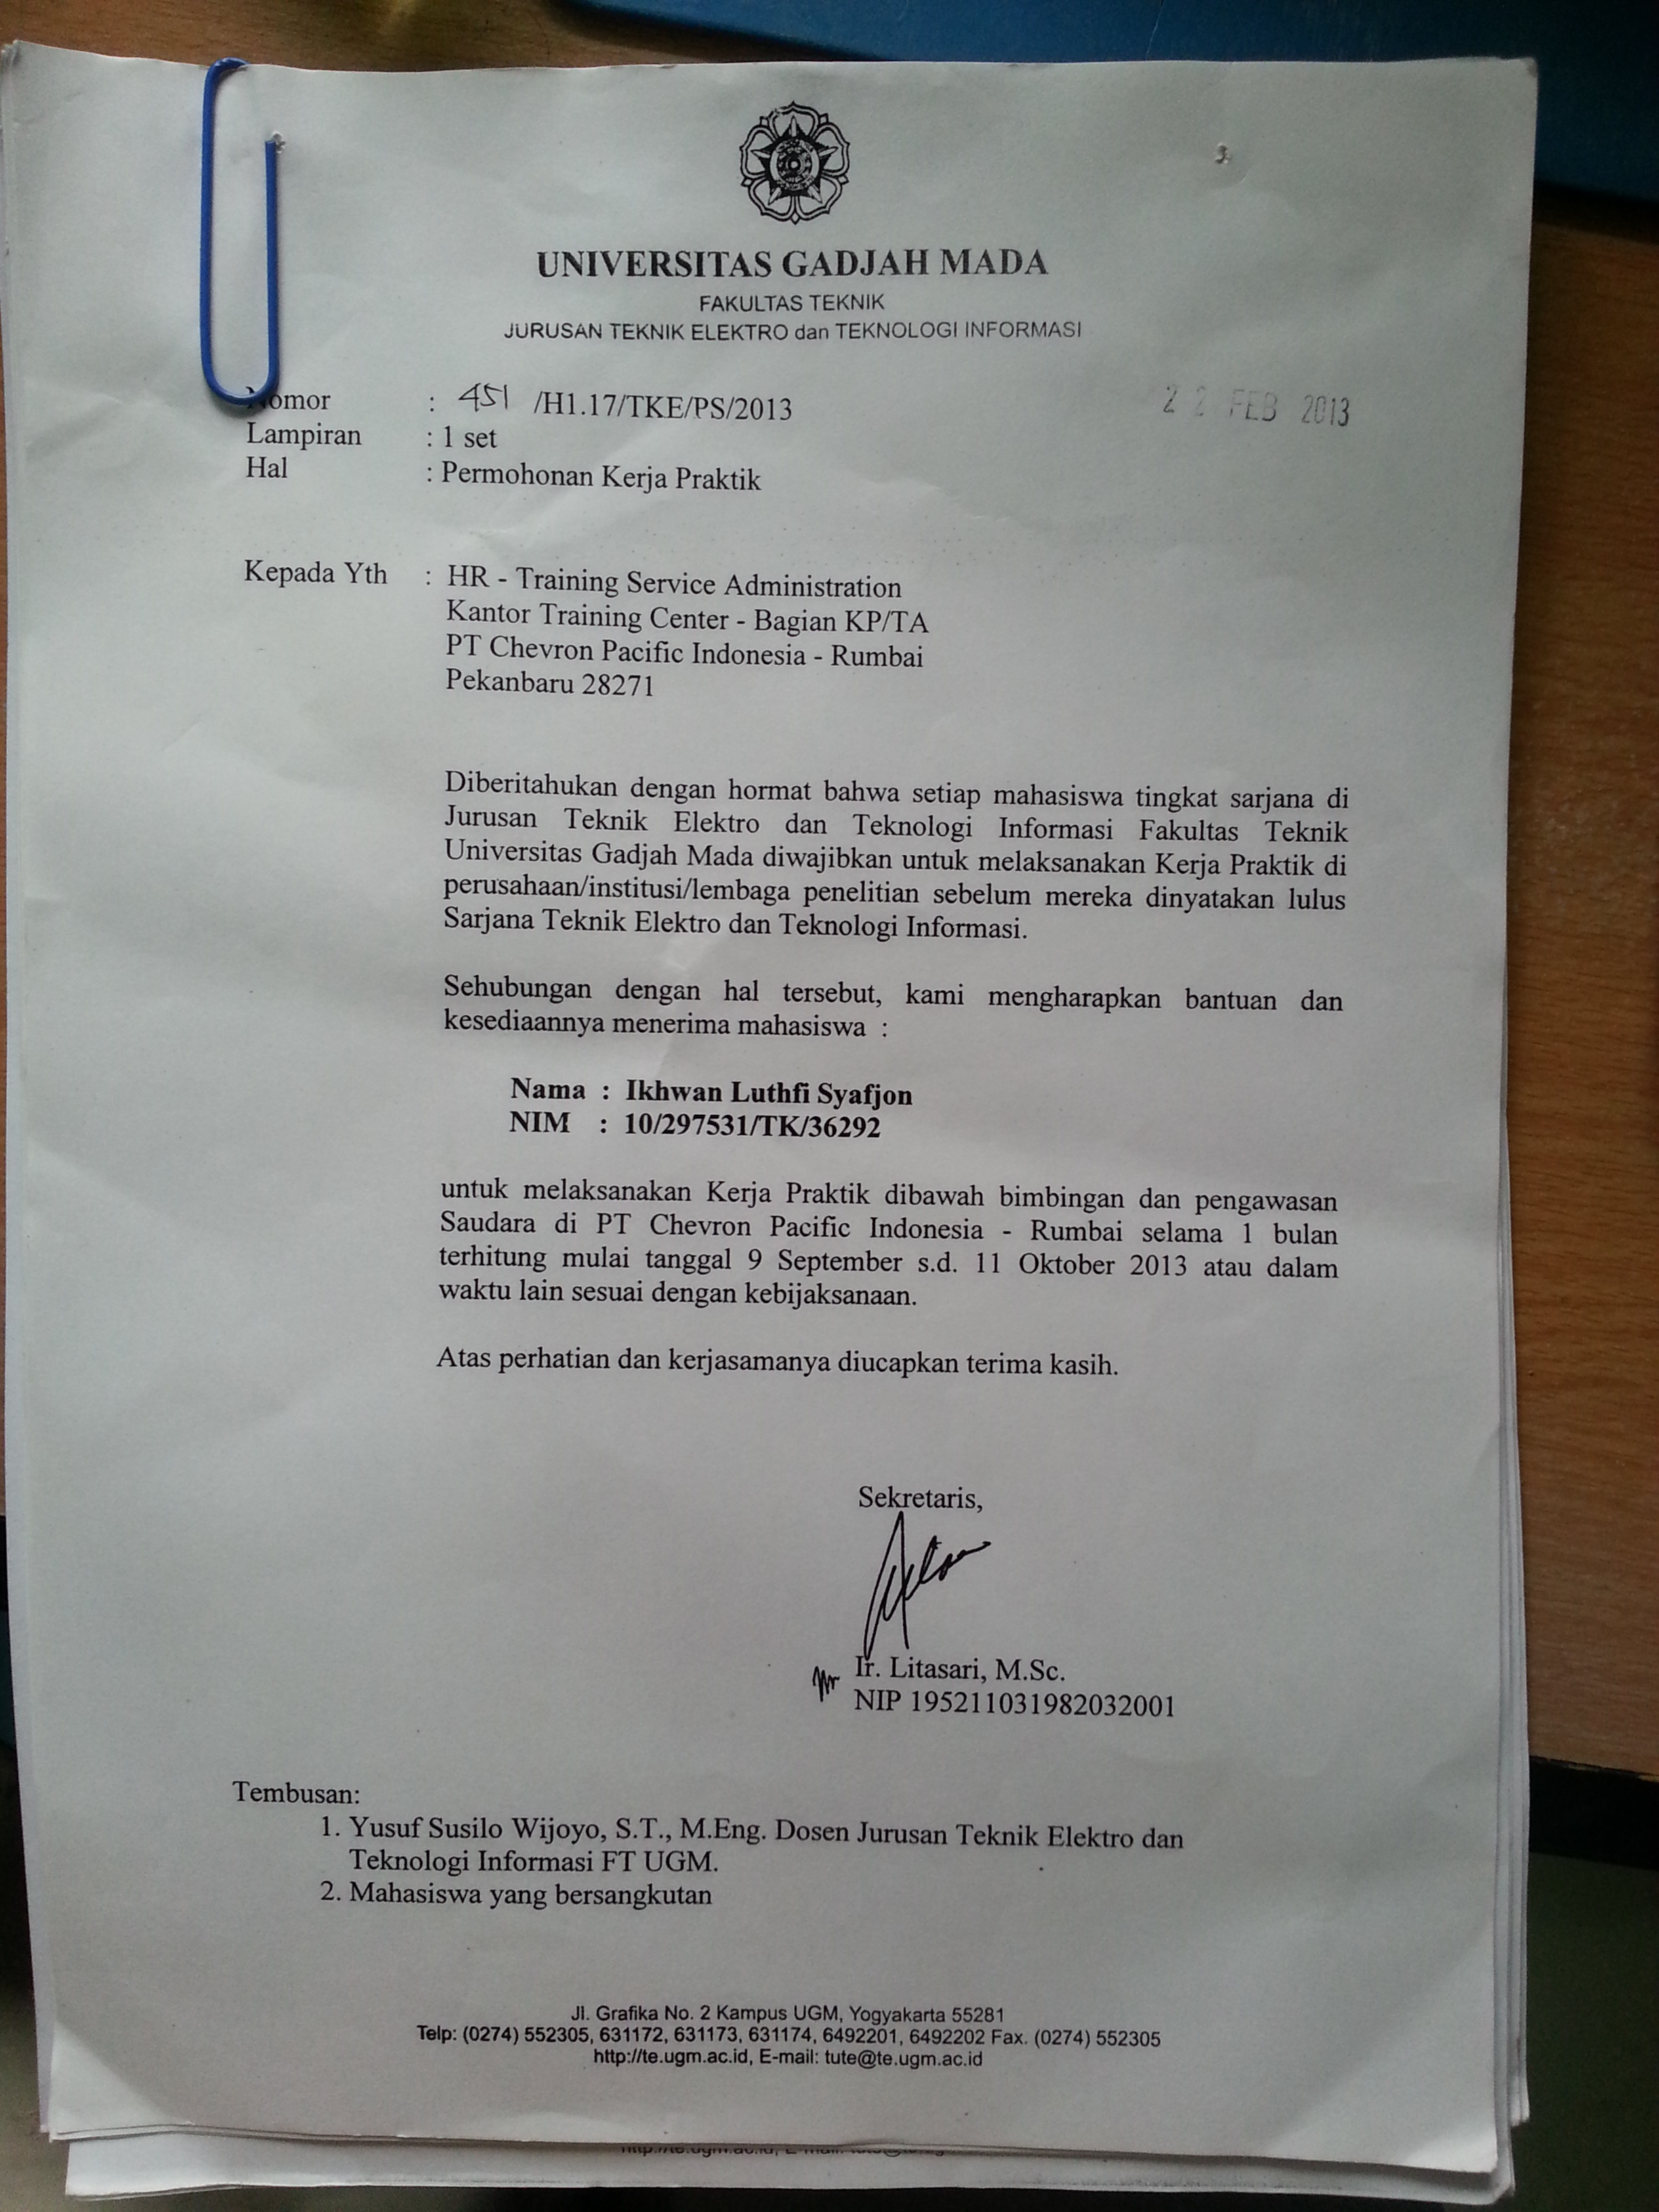 Kerja Praktik Di Pt Chevron Pacific Indonesia Yg Warna Biru